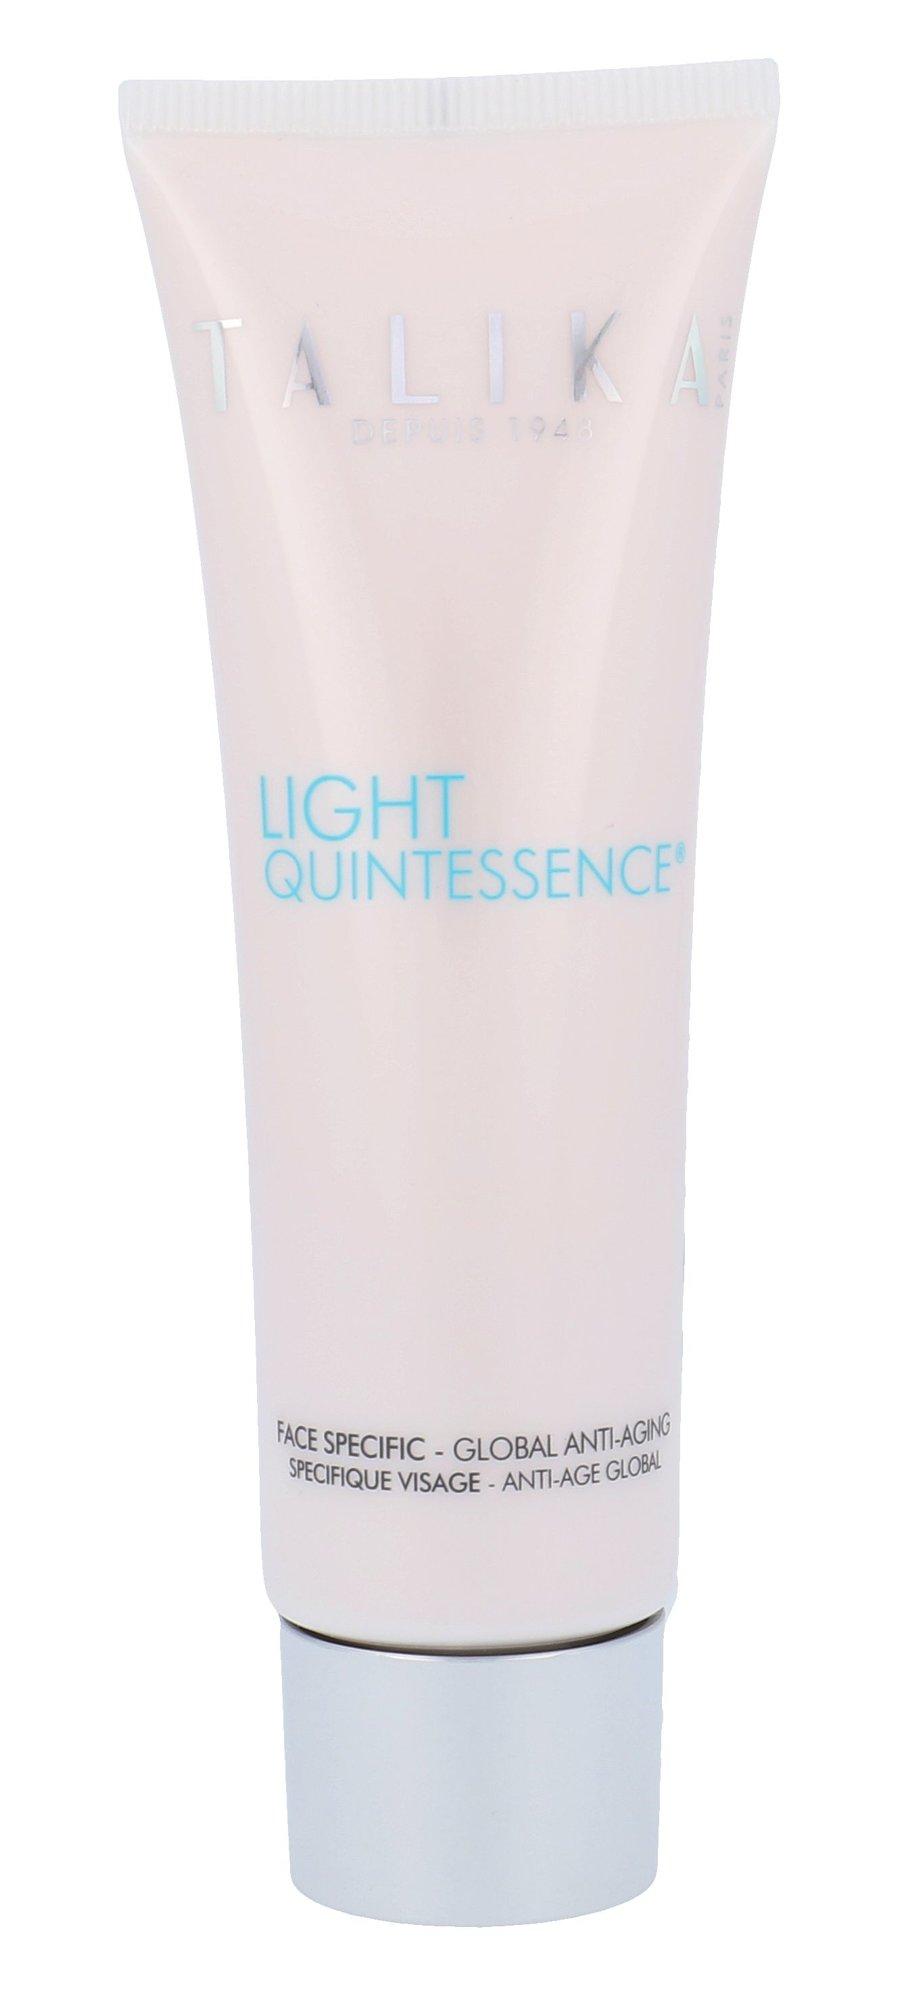 Talika Light Quintessence Cosmetic 30ml  SPF15